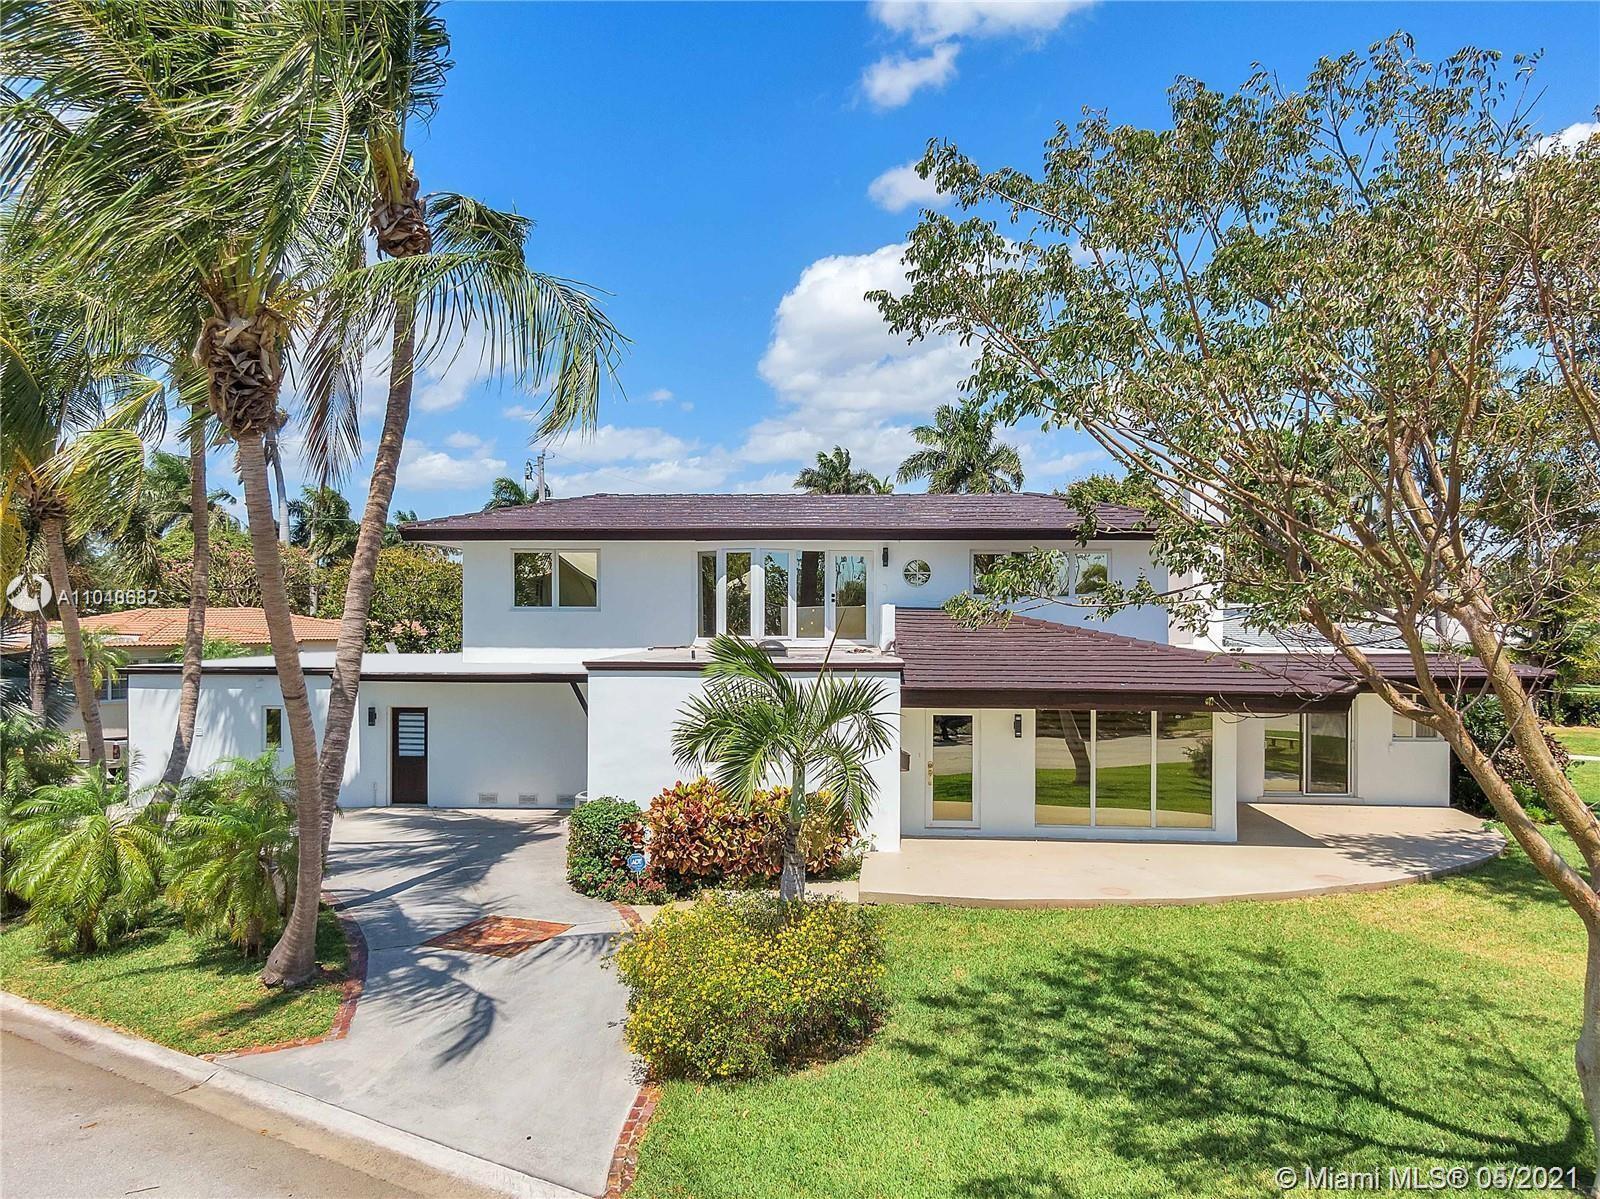 Hollywood Lakes - 911 N Northlake Dr, Hollywood, FL 33019